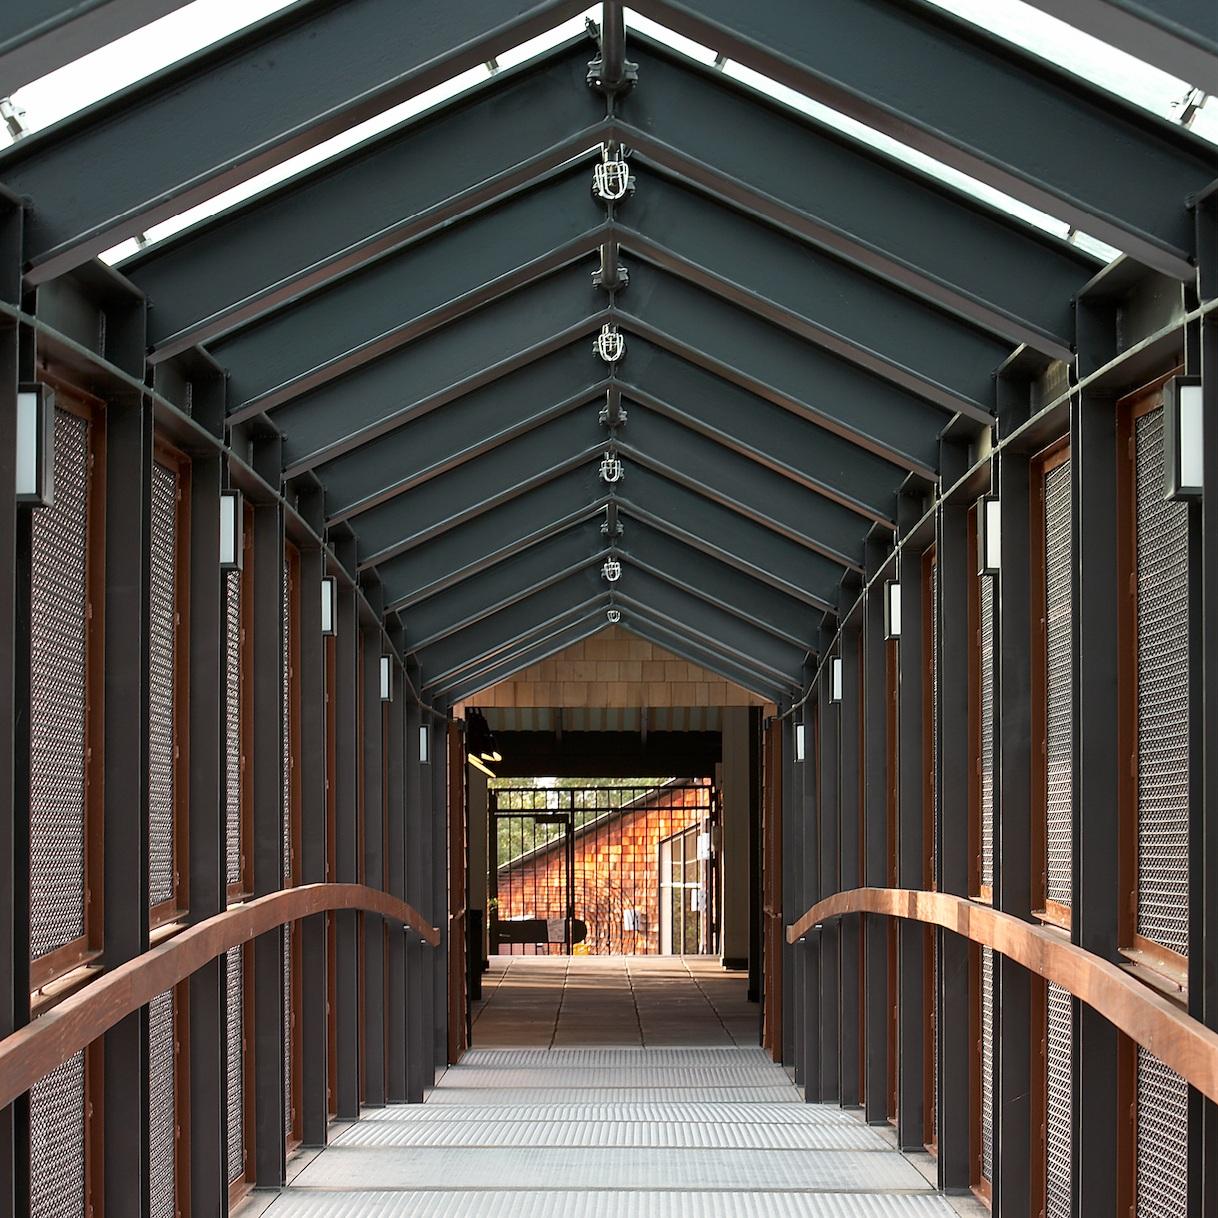 La Loma/Foothill Bridge, Berkeley